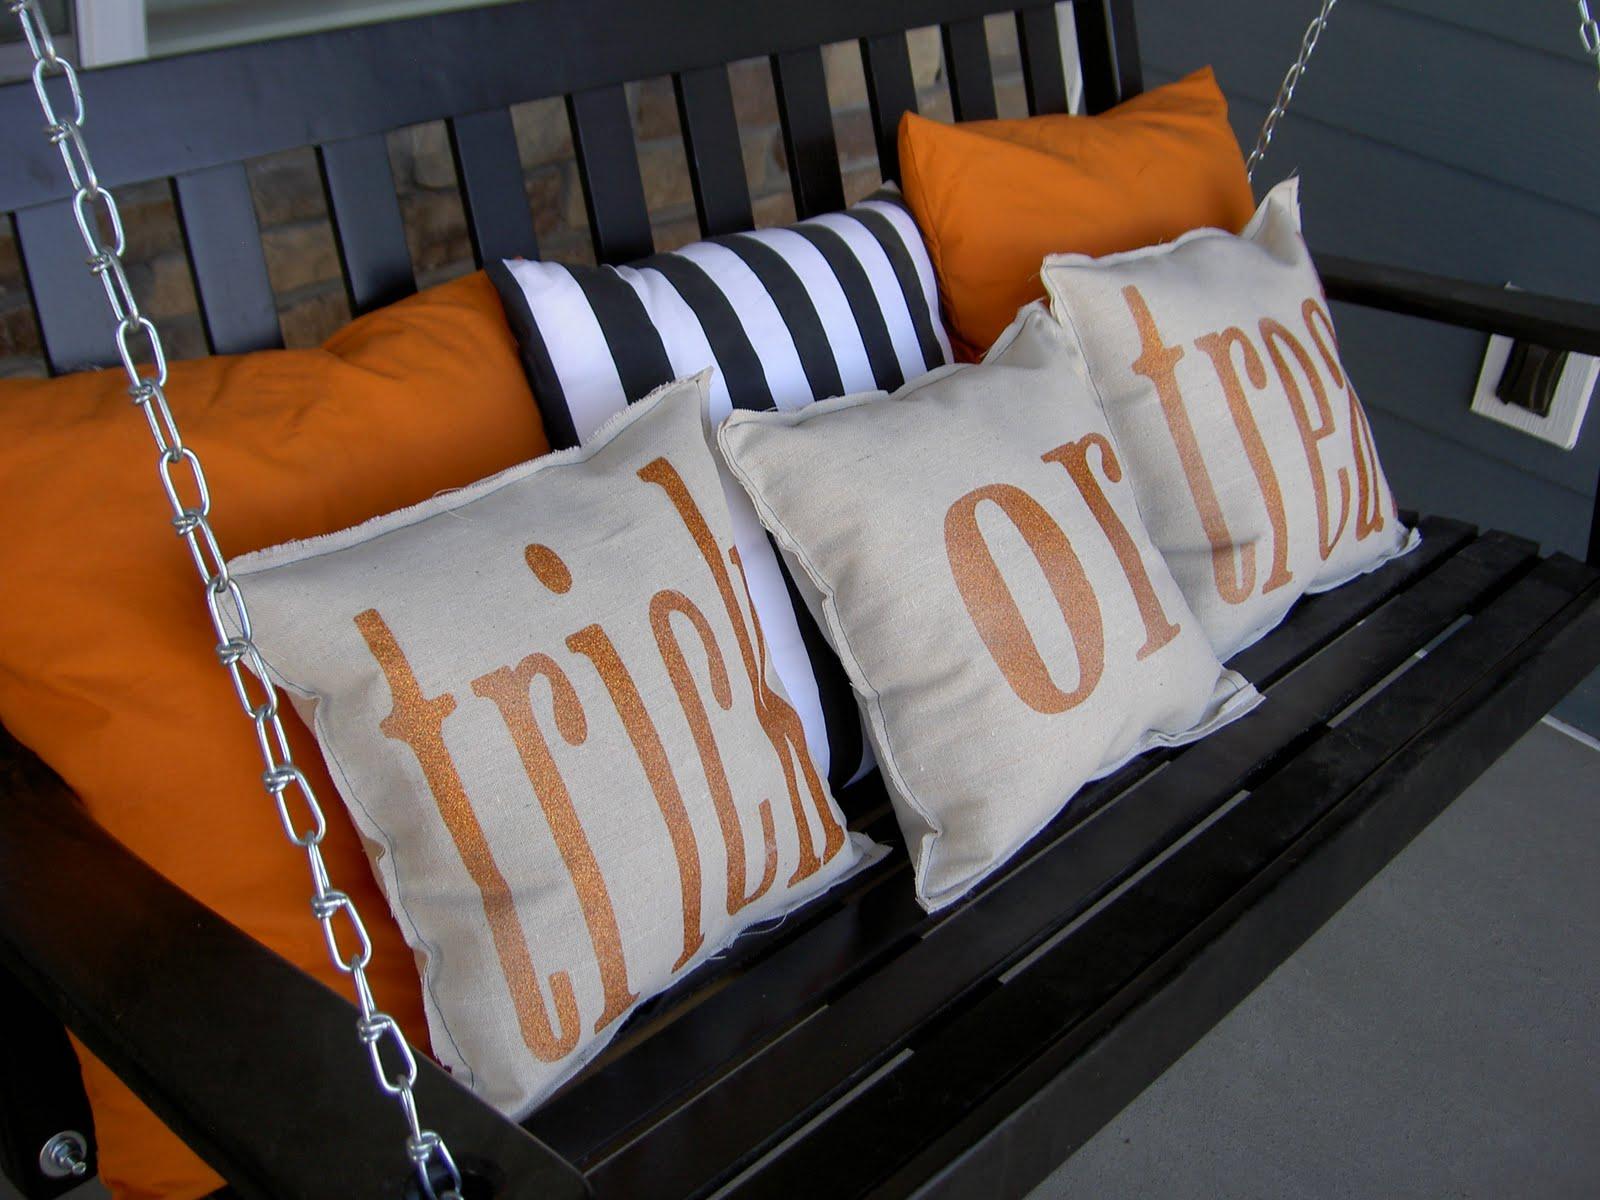 Tie Dye Cushions Indigo Pillow Decorative Cotton Throw Shibori Pillow Cases Outdoor Cushion Cover 16x16 Bohemian